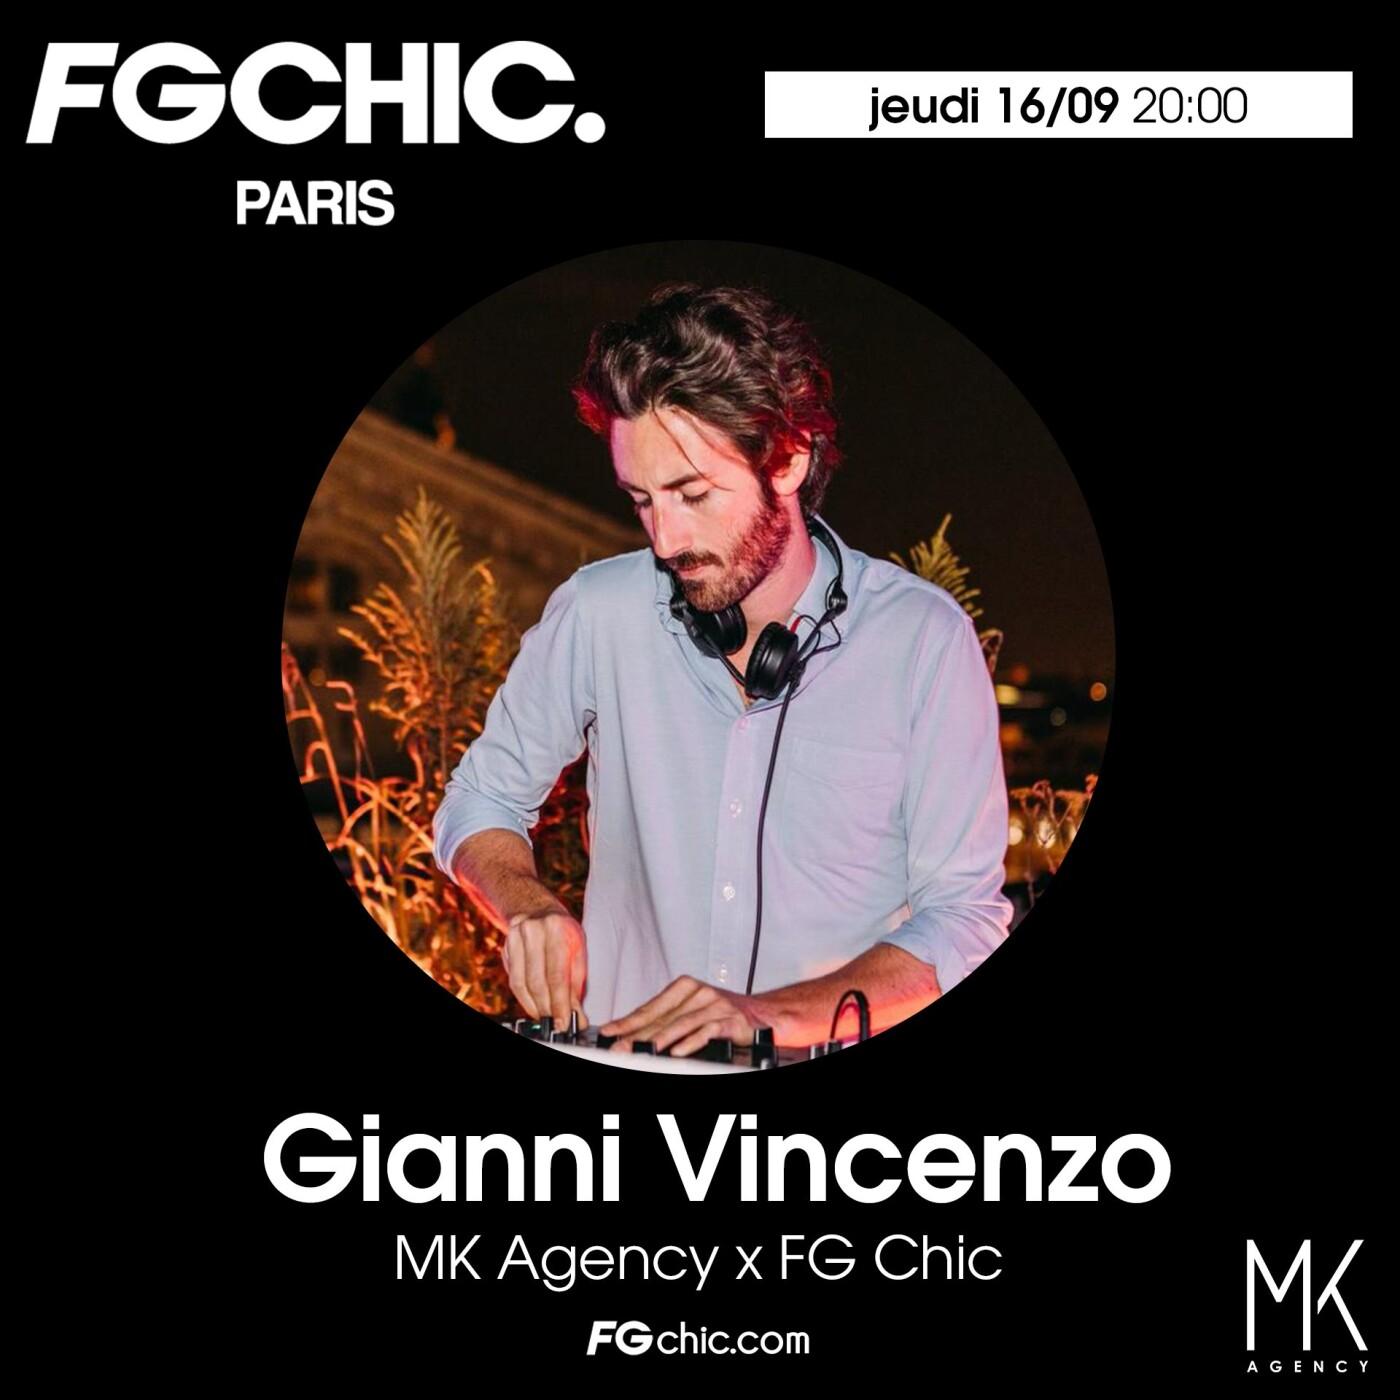 MK AGENCY VS FG CHIC BY GIANNI VINCENZO